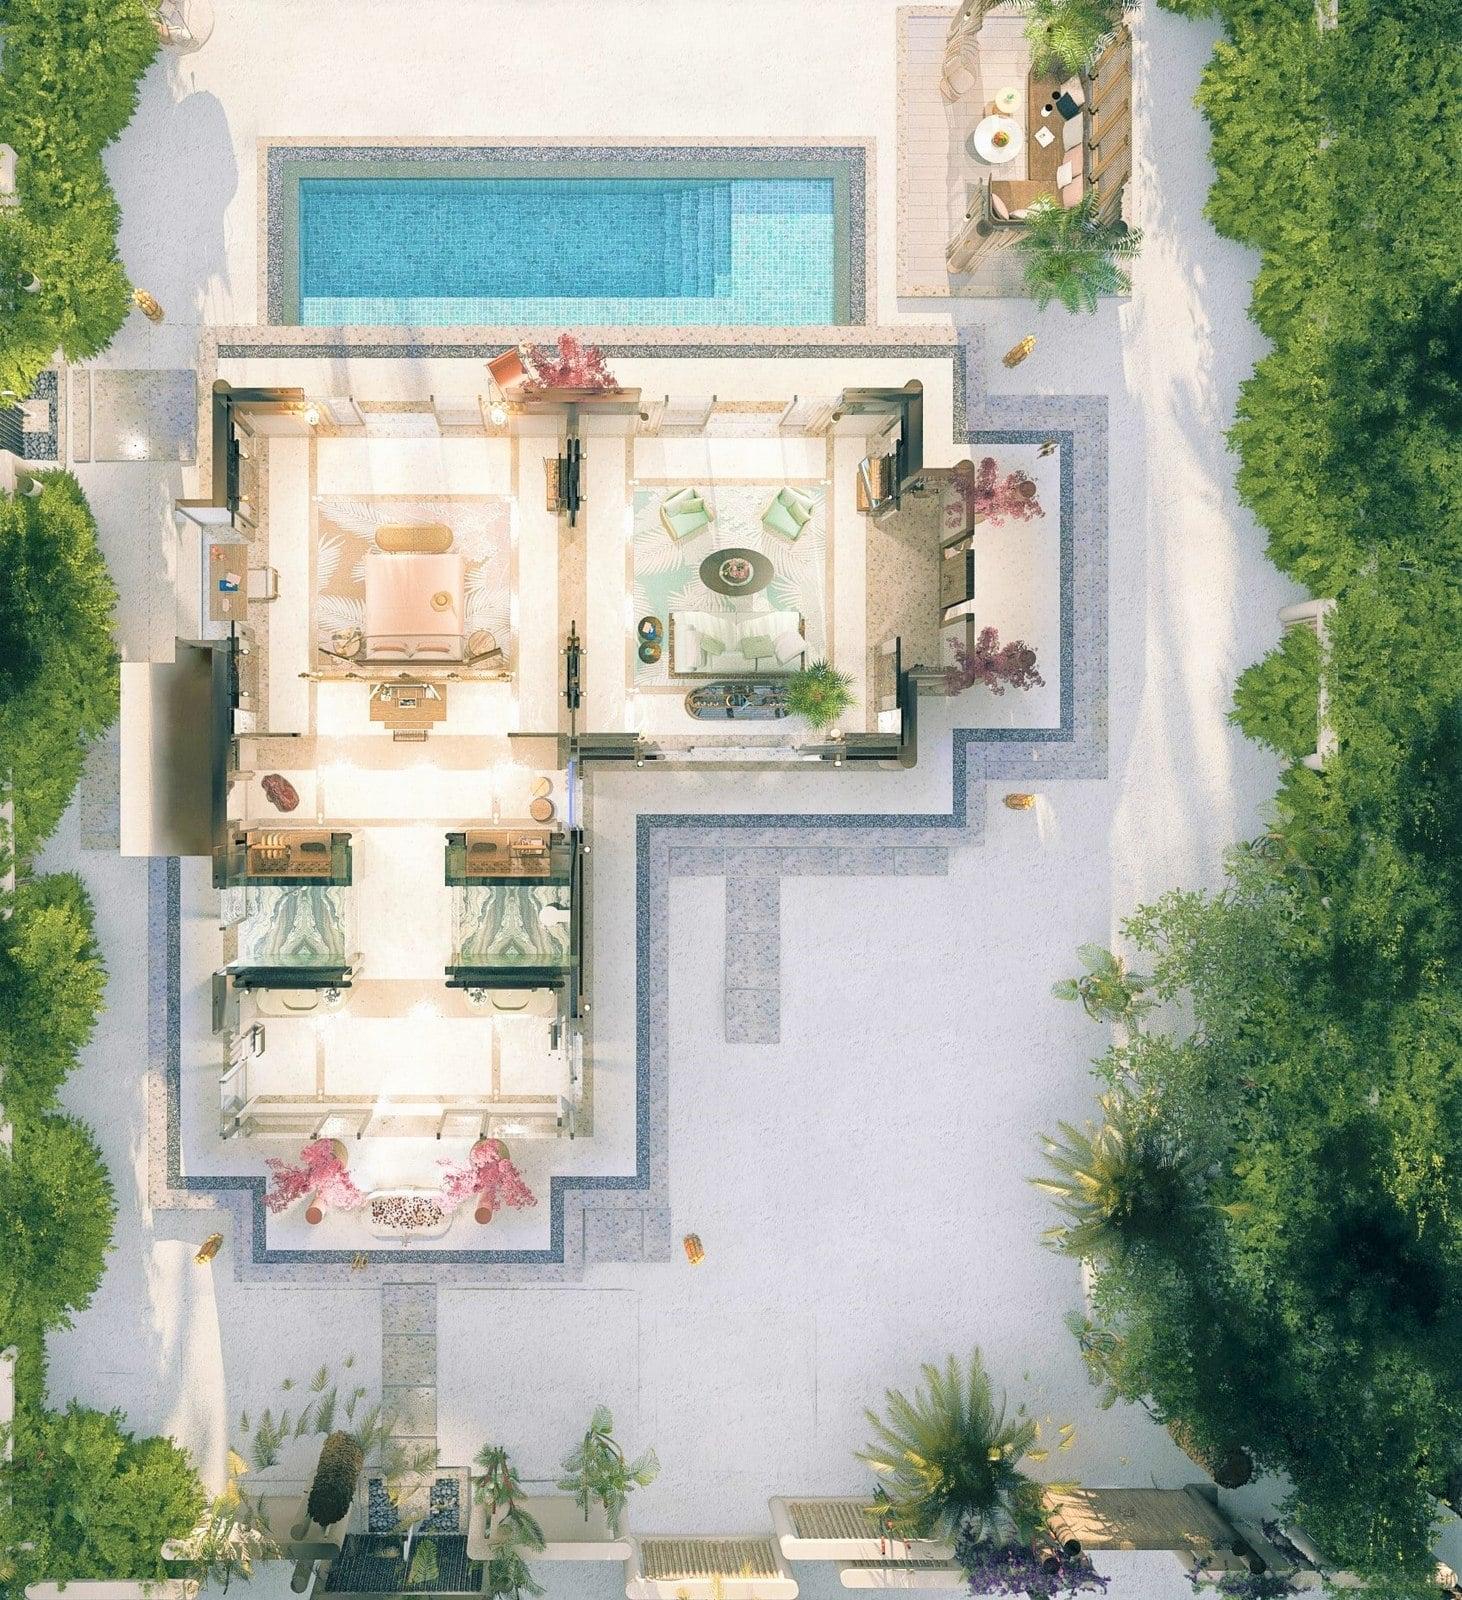 Мальдивы, отель Joali Maldives, план-схема номера Luxury Beach Villa with Pool